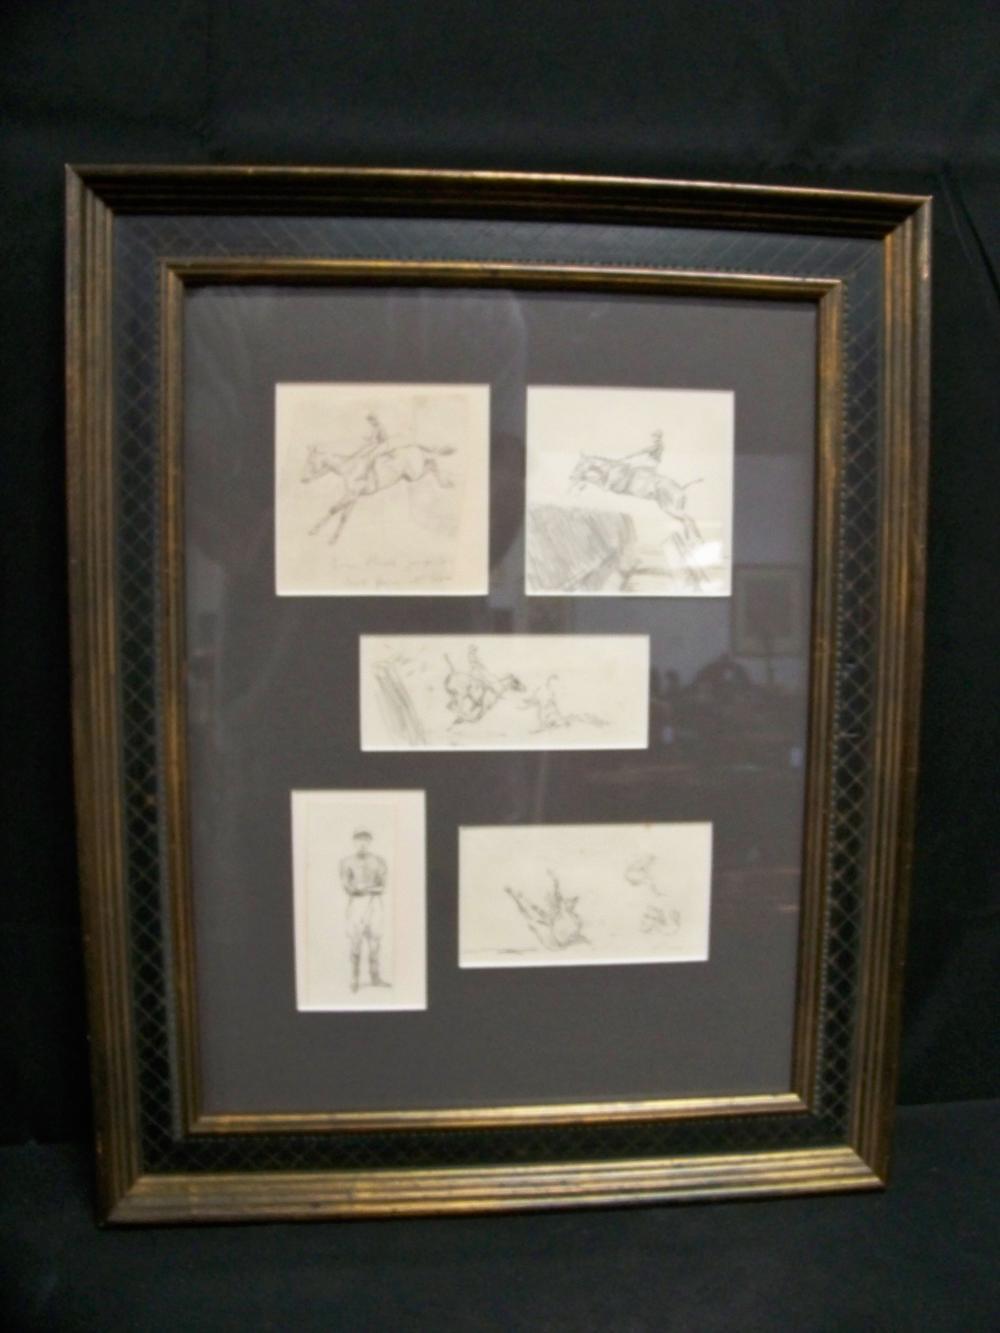 Framed Montage of Horses by Peter Biegel